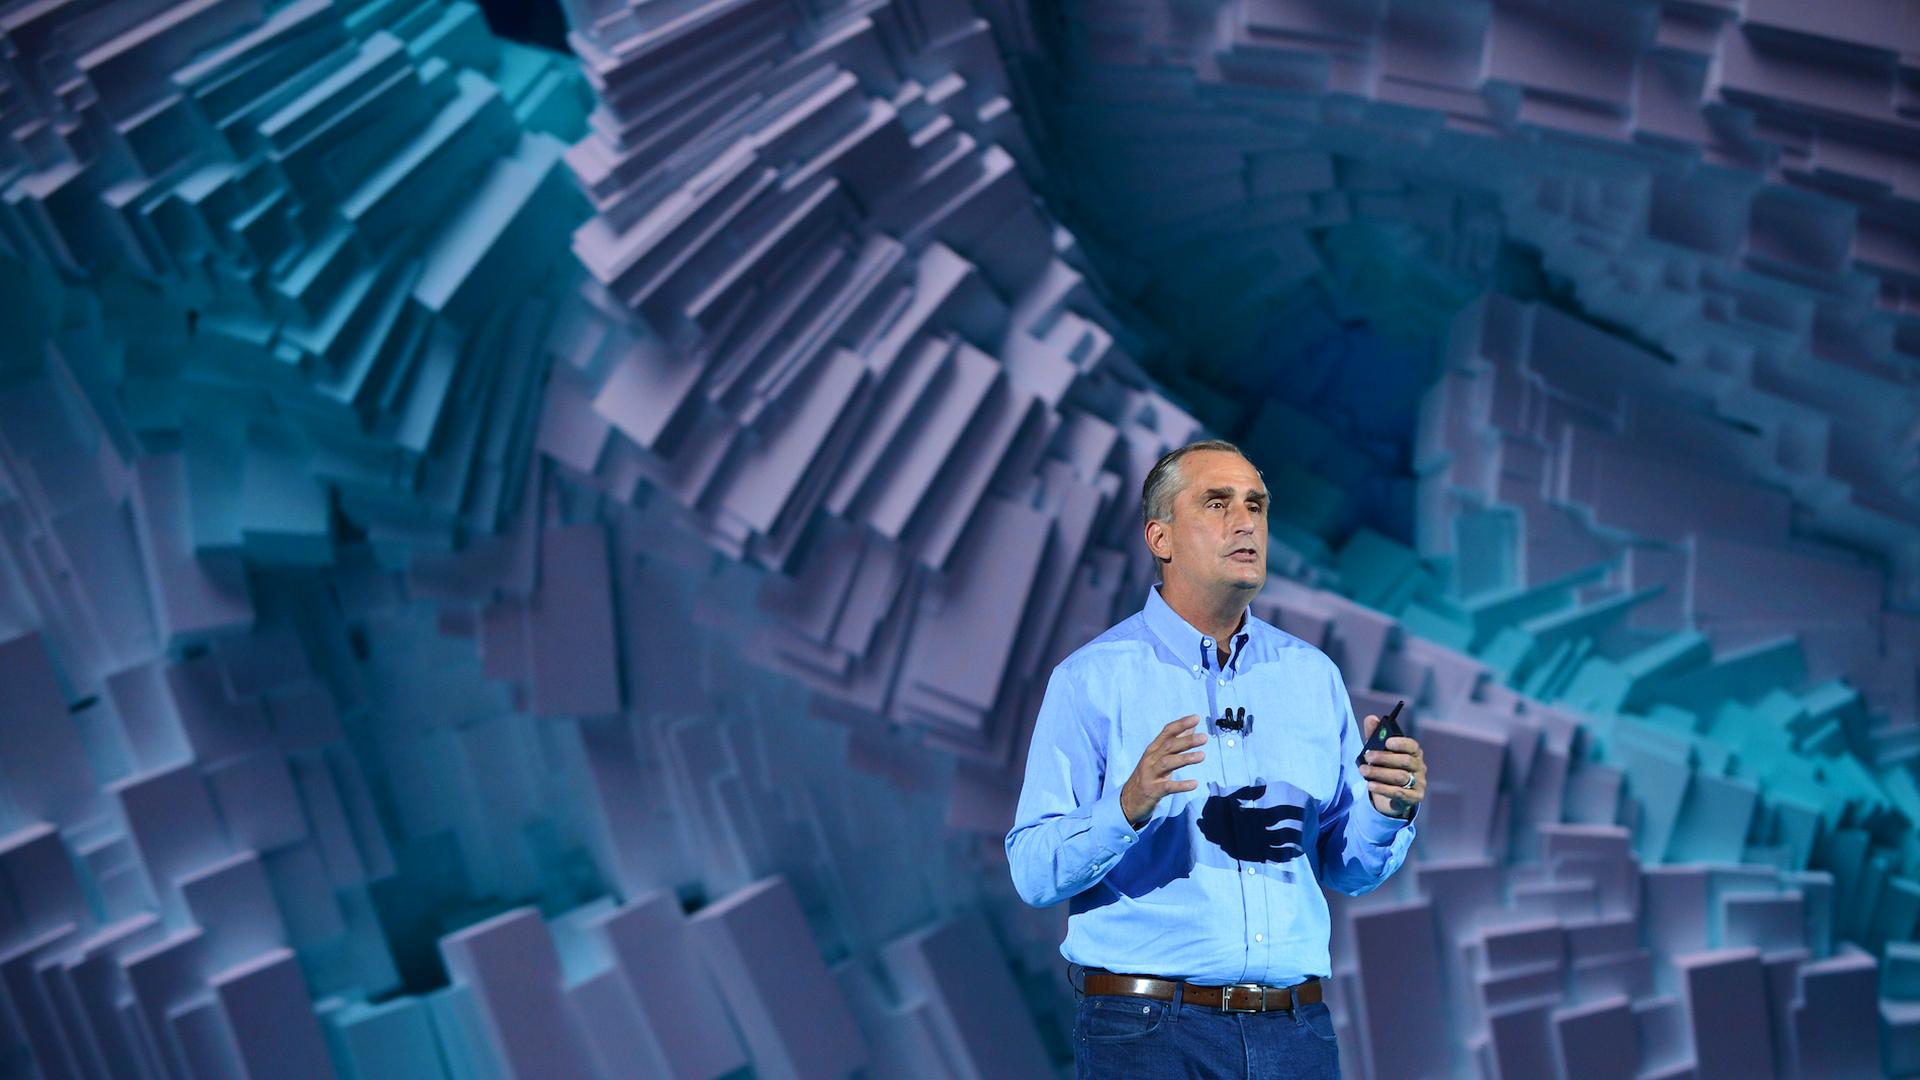 Intel CEO Brian Krzanich, speaking at CES 2018